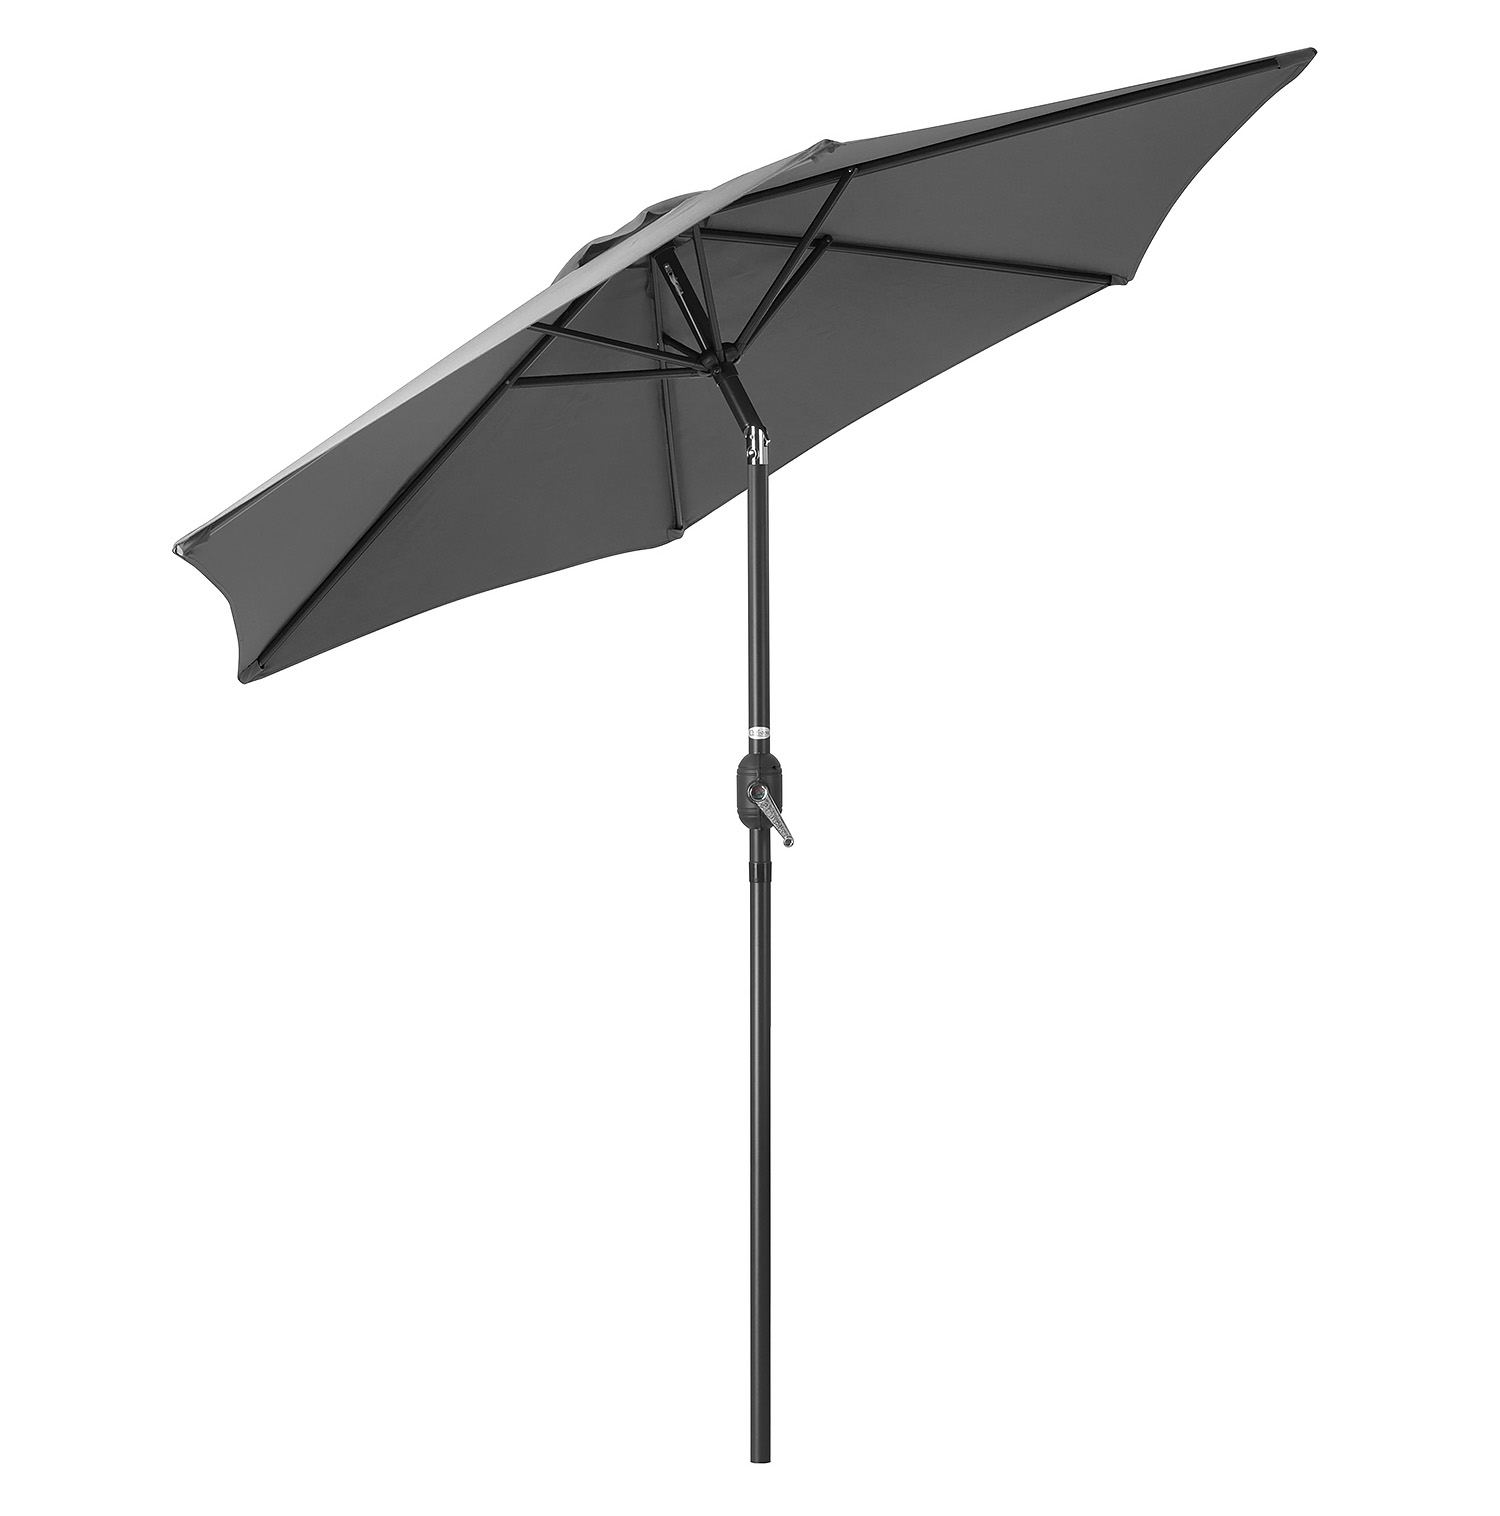 Image of 2.4m Tilting Parasol - Grey